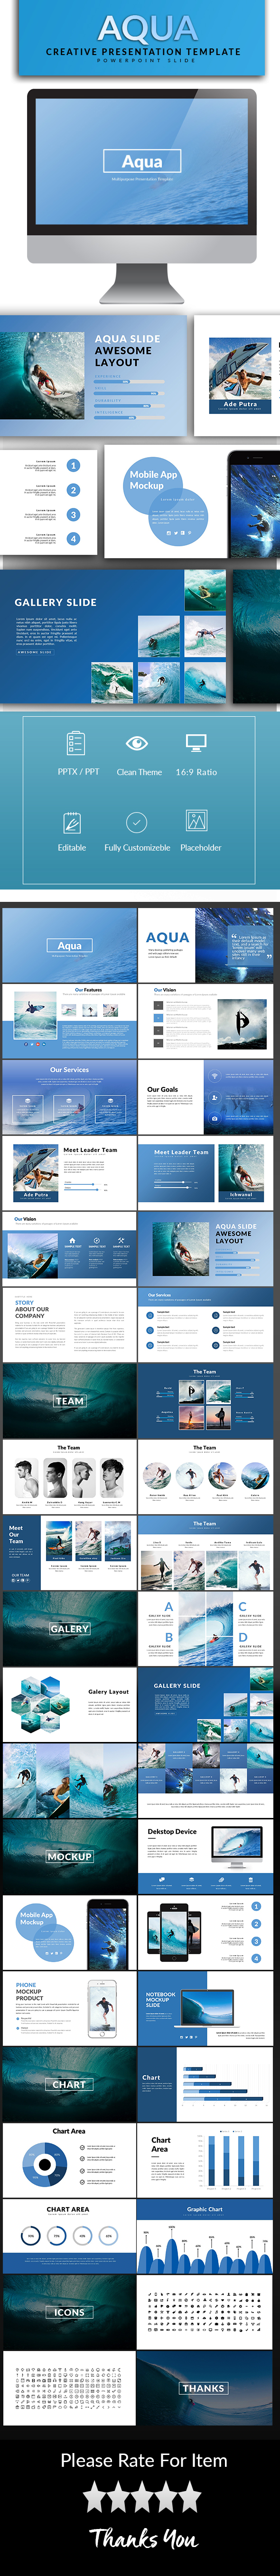 Aqua Powerpoint Template - PowerPoint Templates Presentation Templates